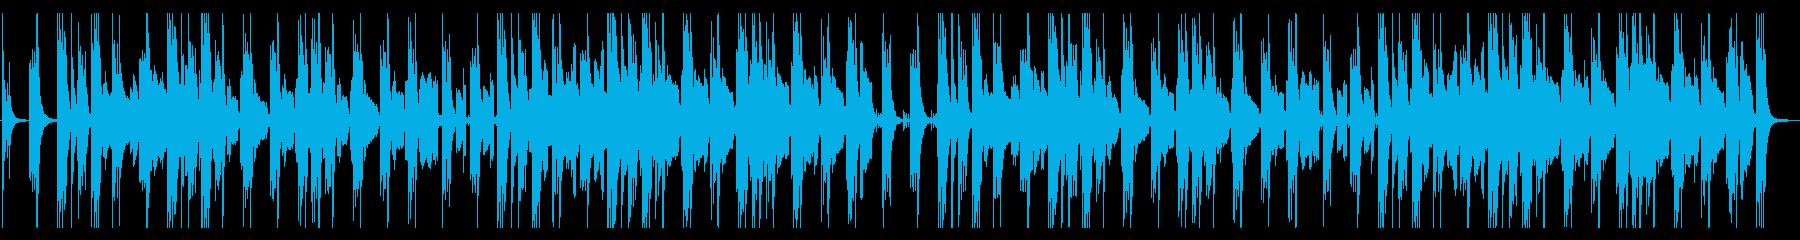 YouTube スティールパン・南国の再生済みの波形